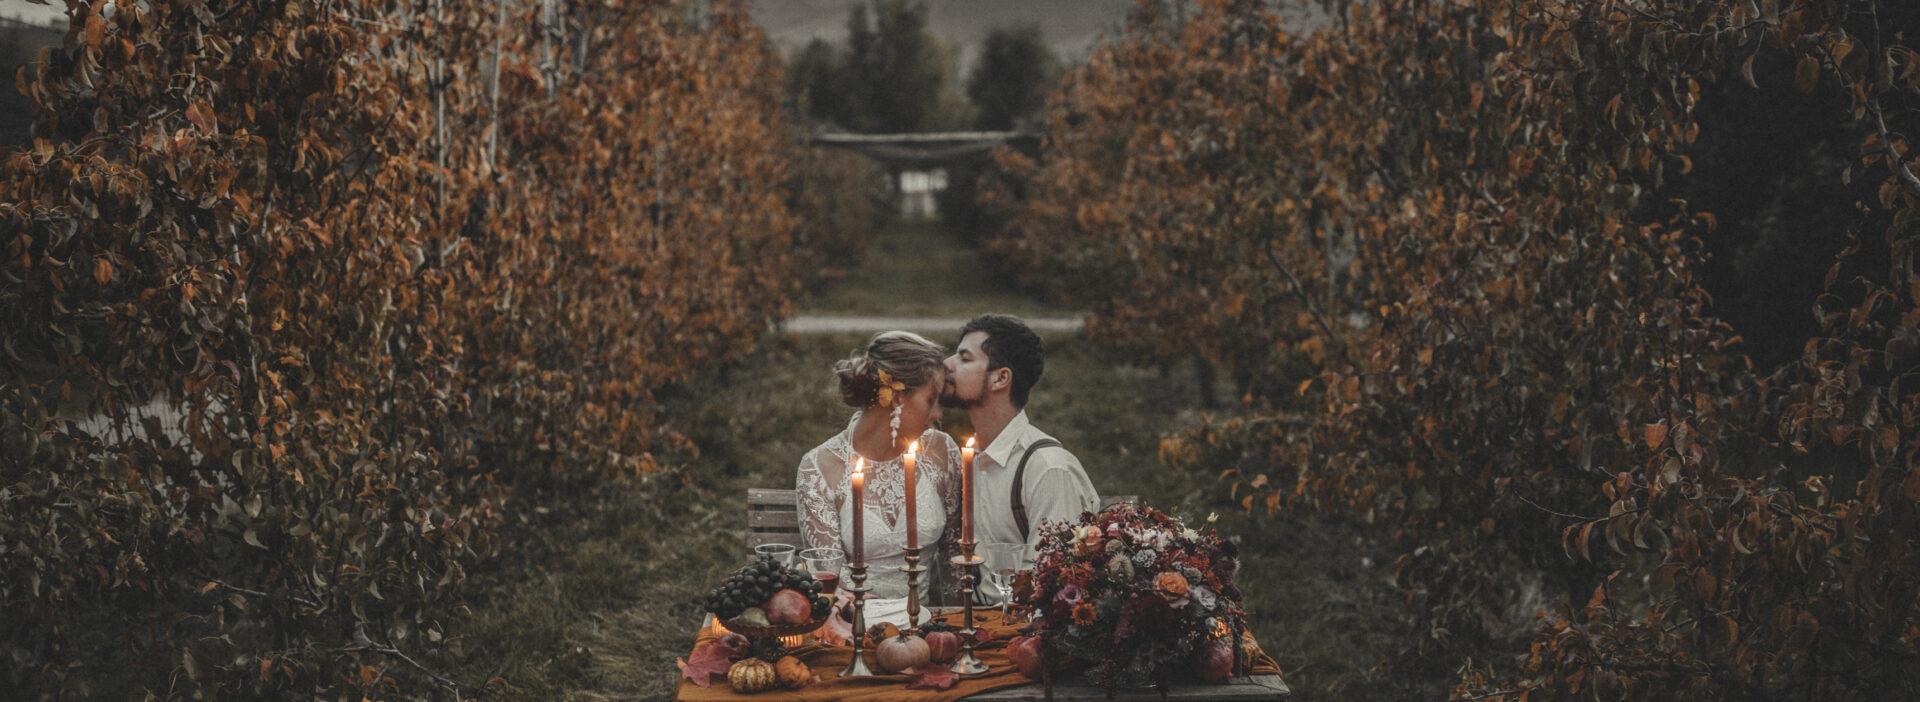 Jucker Farm Bächlihof Hochzeit (c) Celine_Soulfulstories